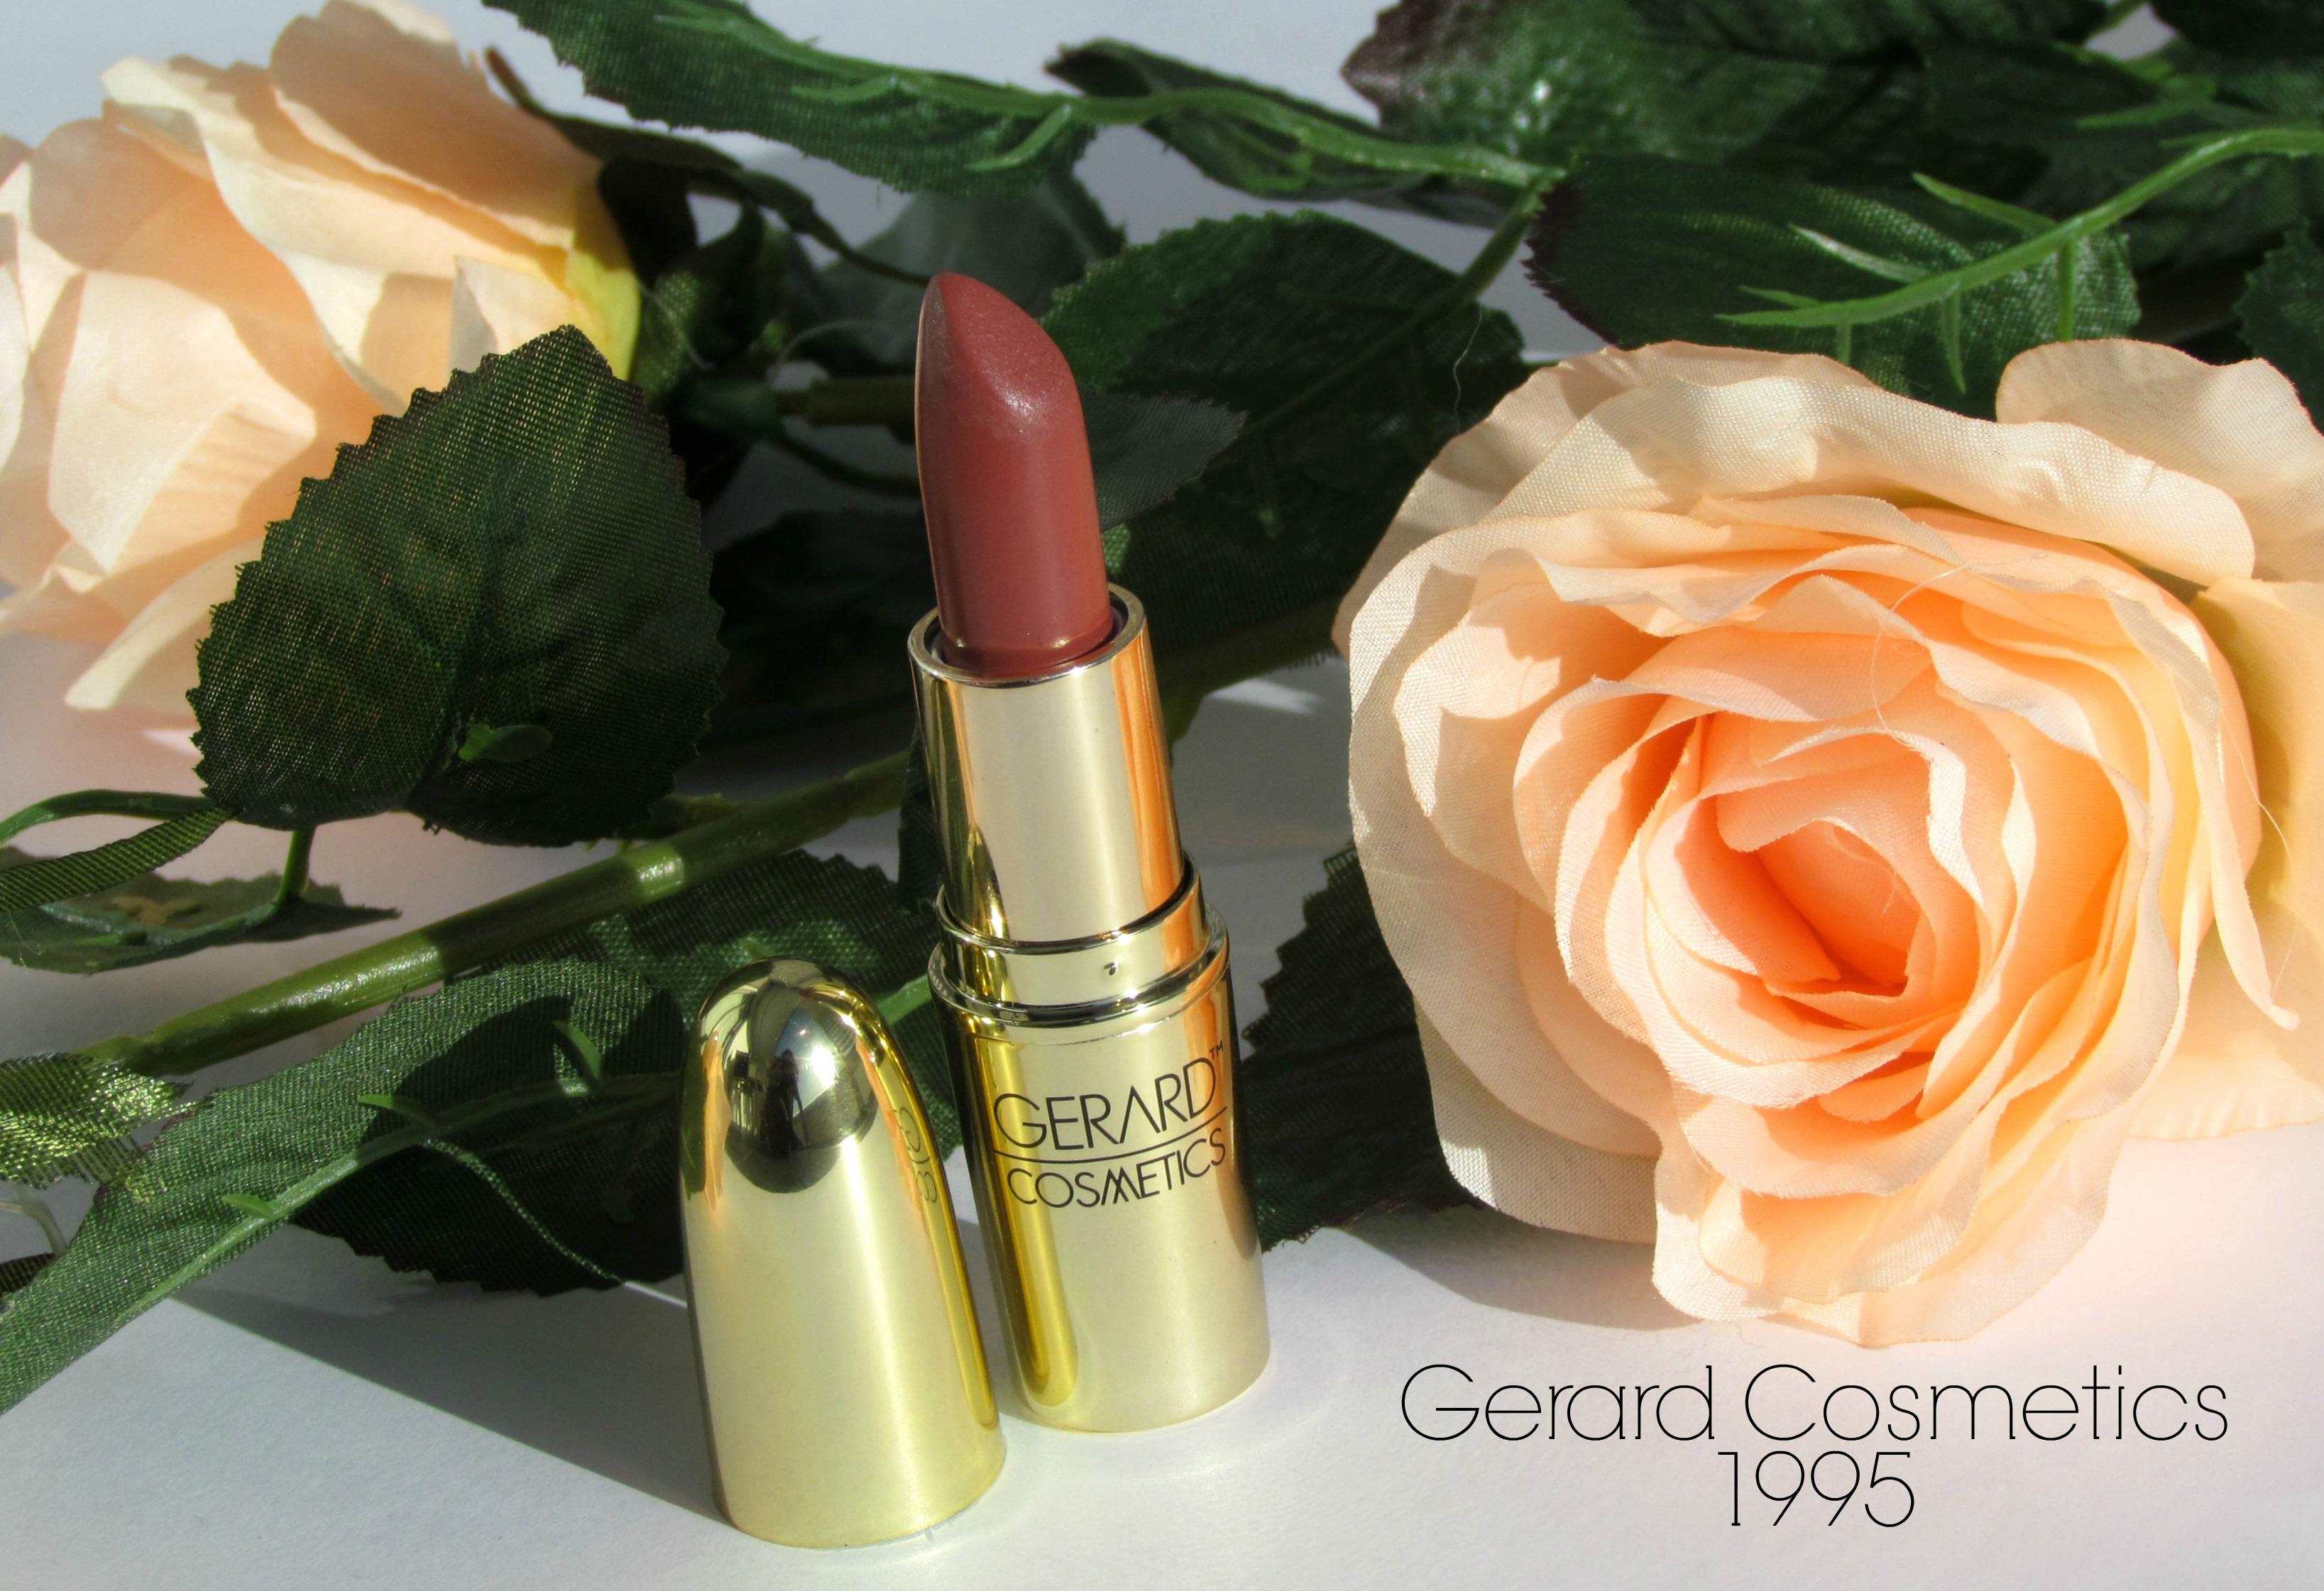 Gerard Cosmetics Lipstick – 1995